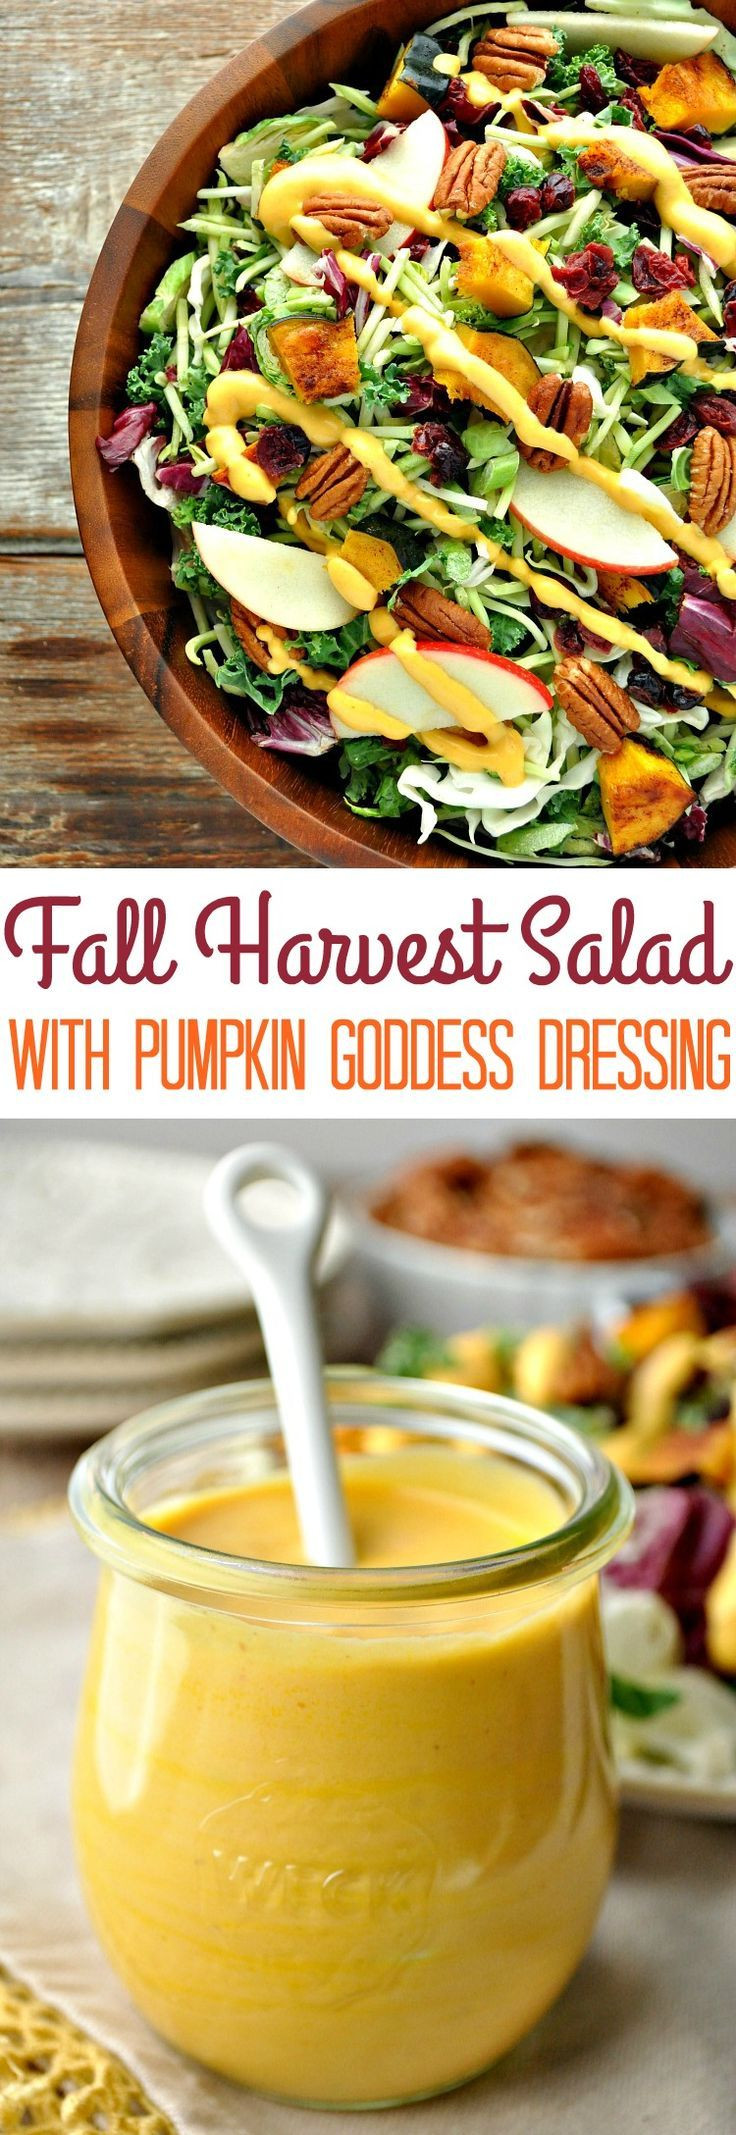 Fall Pumpkin Recipes  Fall Harvest Salad with Pumpkin Goddess Dressing